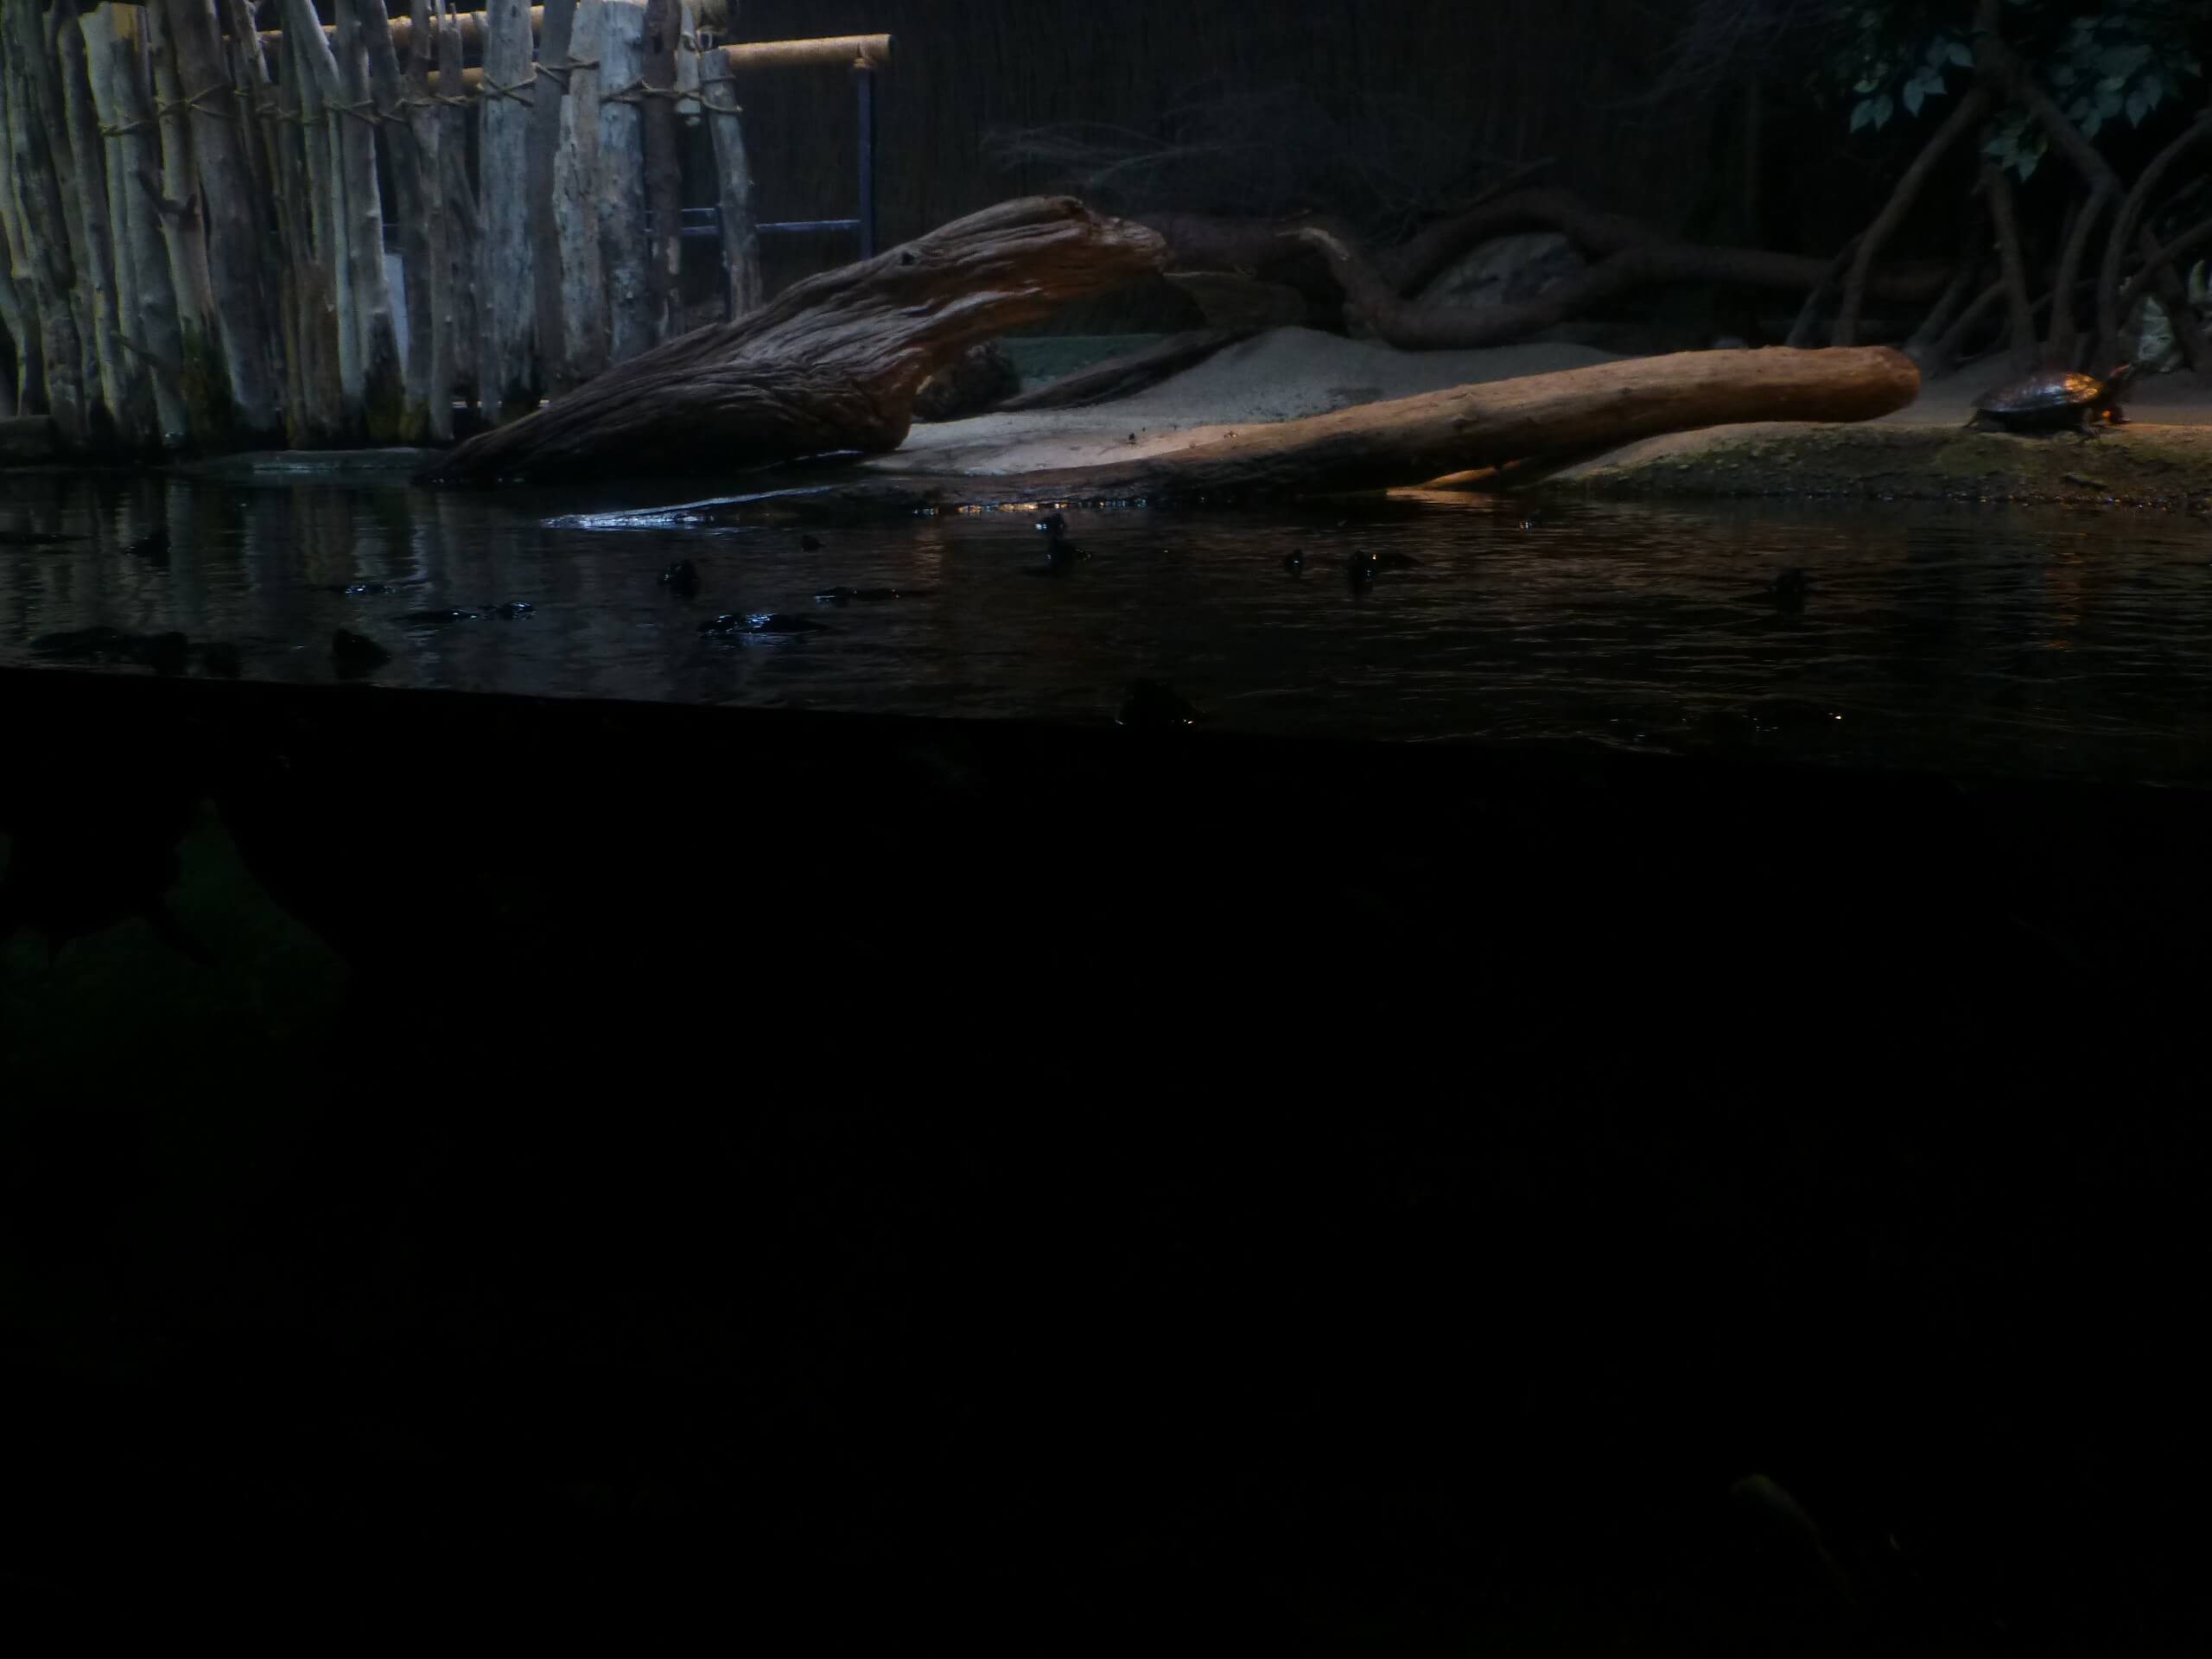 Weit weg Reisen, National Aquarium, Napier 10